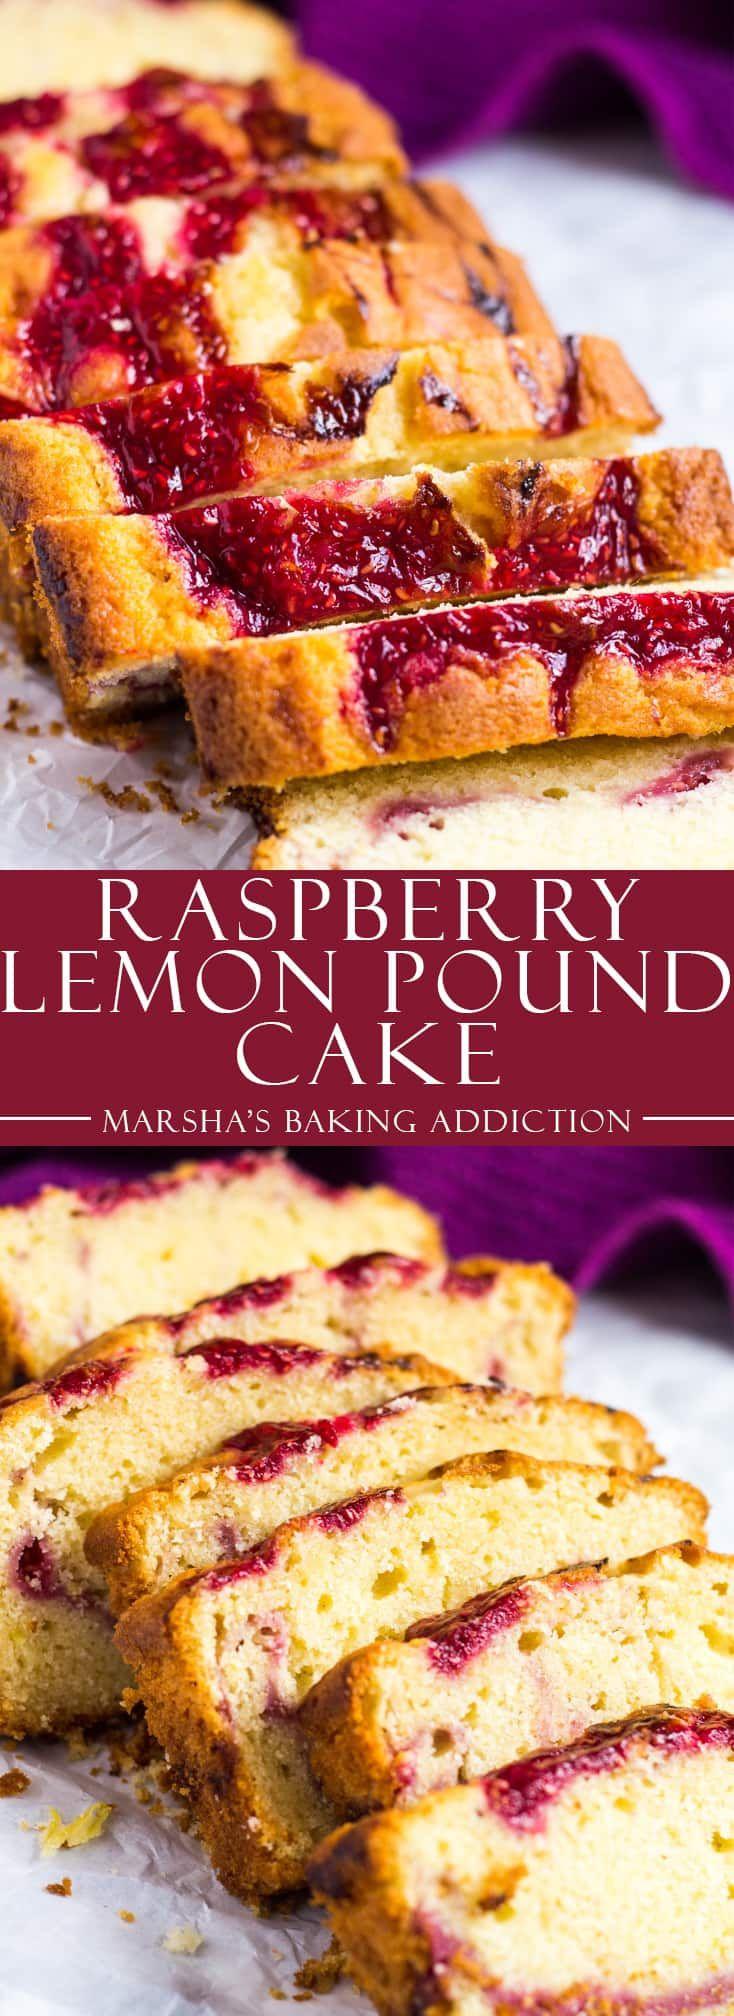 Raspberry Swirl Lemon Pound Cake   marshasbakingaddiction.com @marshasbakeblog